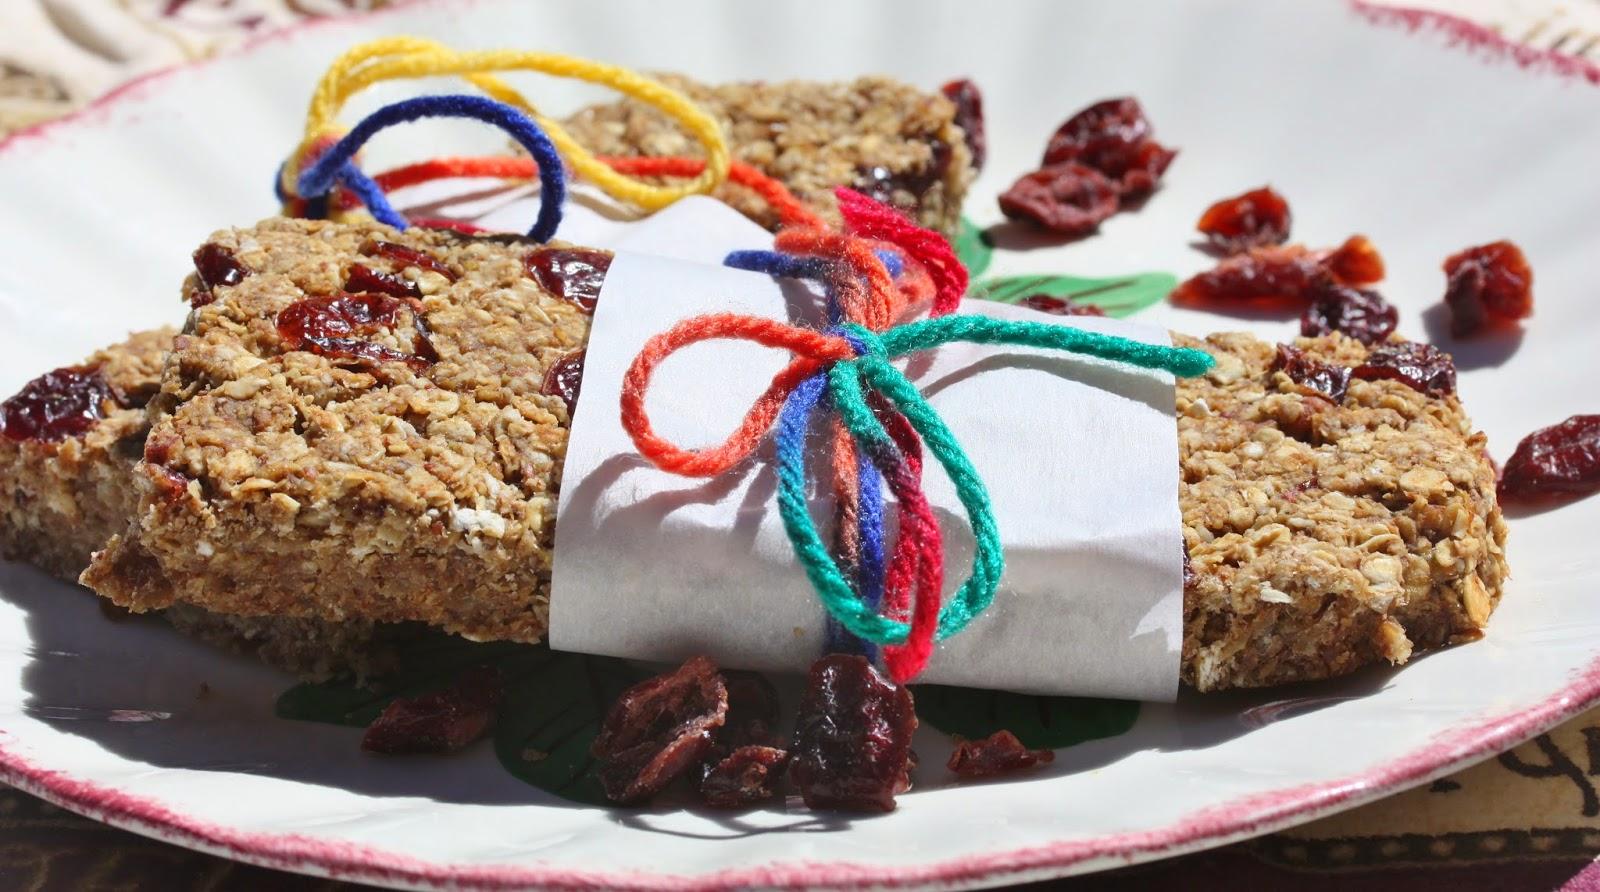 ... Granola Bars With Bananas, Cranberries & Pecans Recipes — Dishmaps